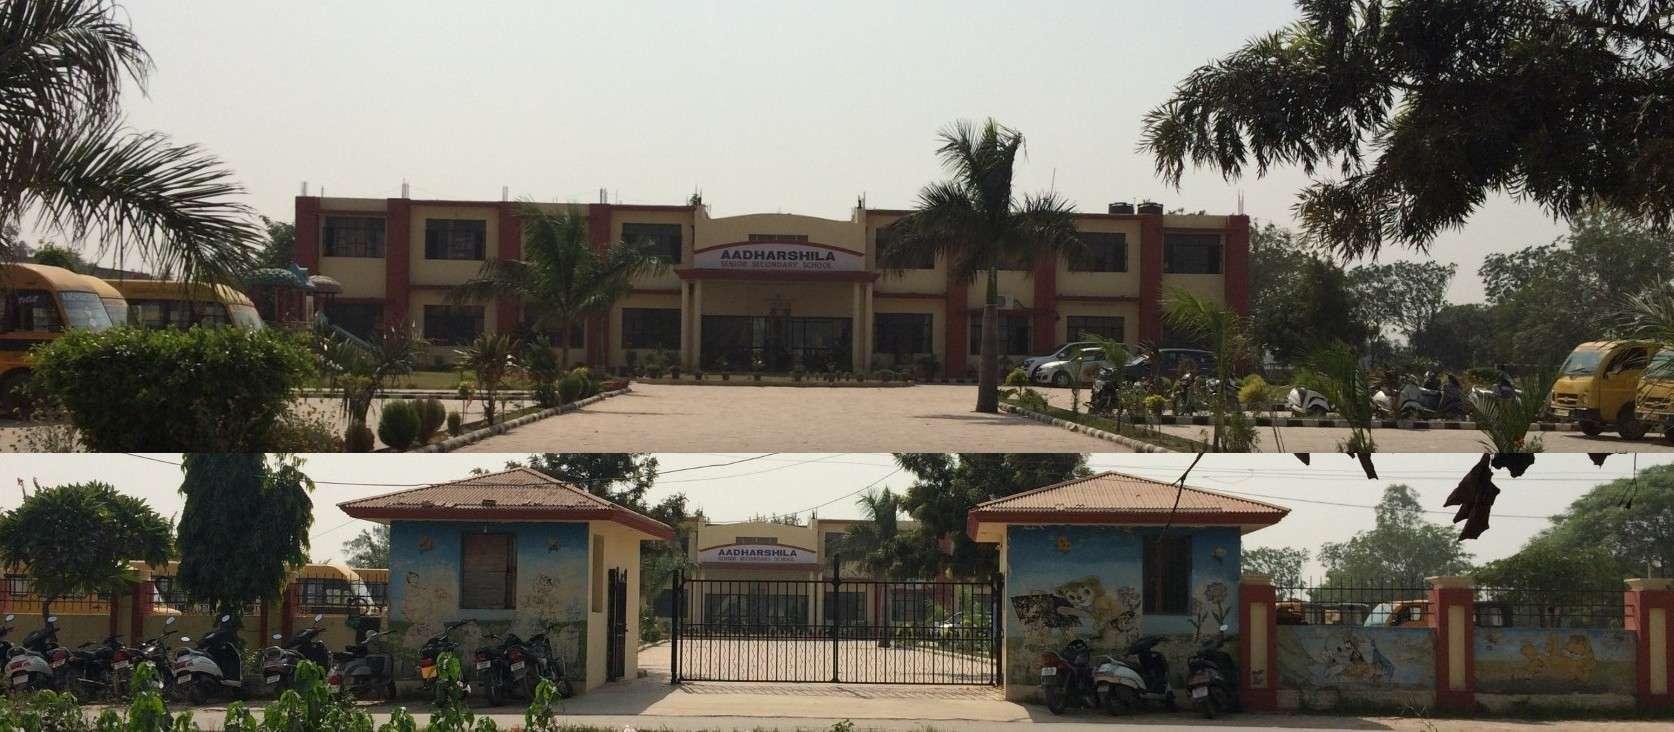 ADHARSHILA THE FOUNDATION INTERNATIONAL SCHOOL THE 4TH MILE STONE PATIALA ROAD VILL BHADOK RAJPURA PUNJAB 1630352